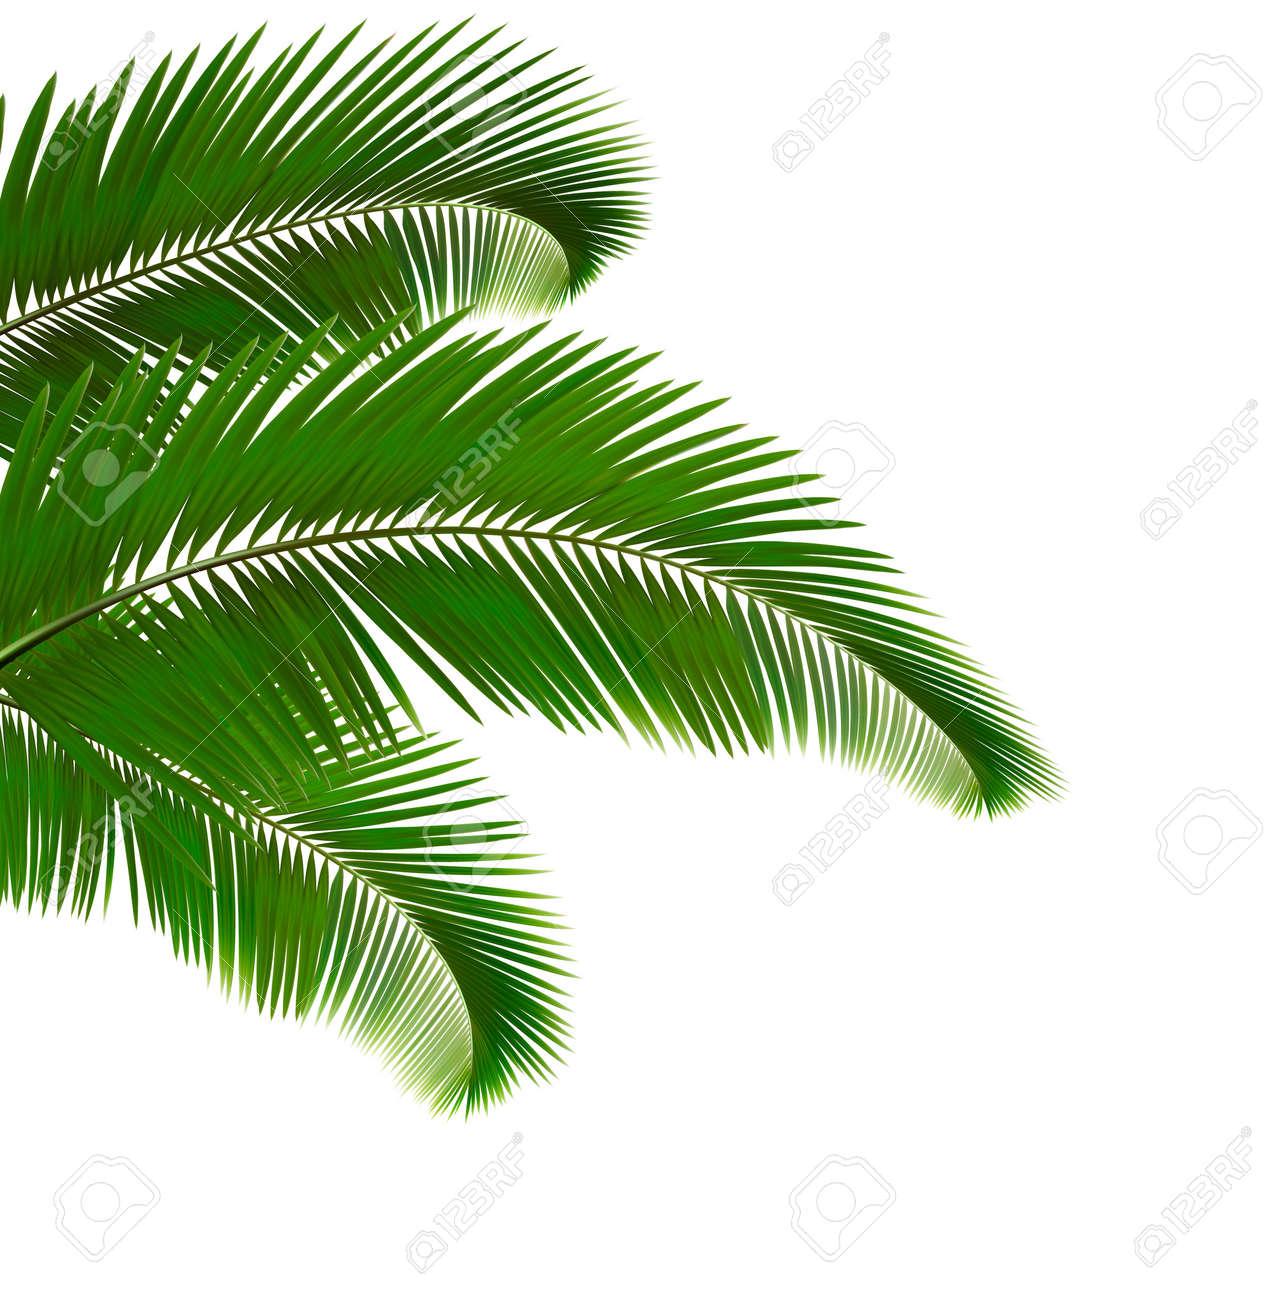 Palm leaves on white background. Vector illustration. - 18120920